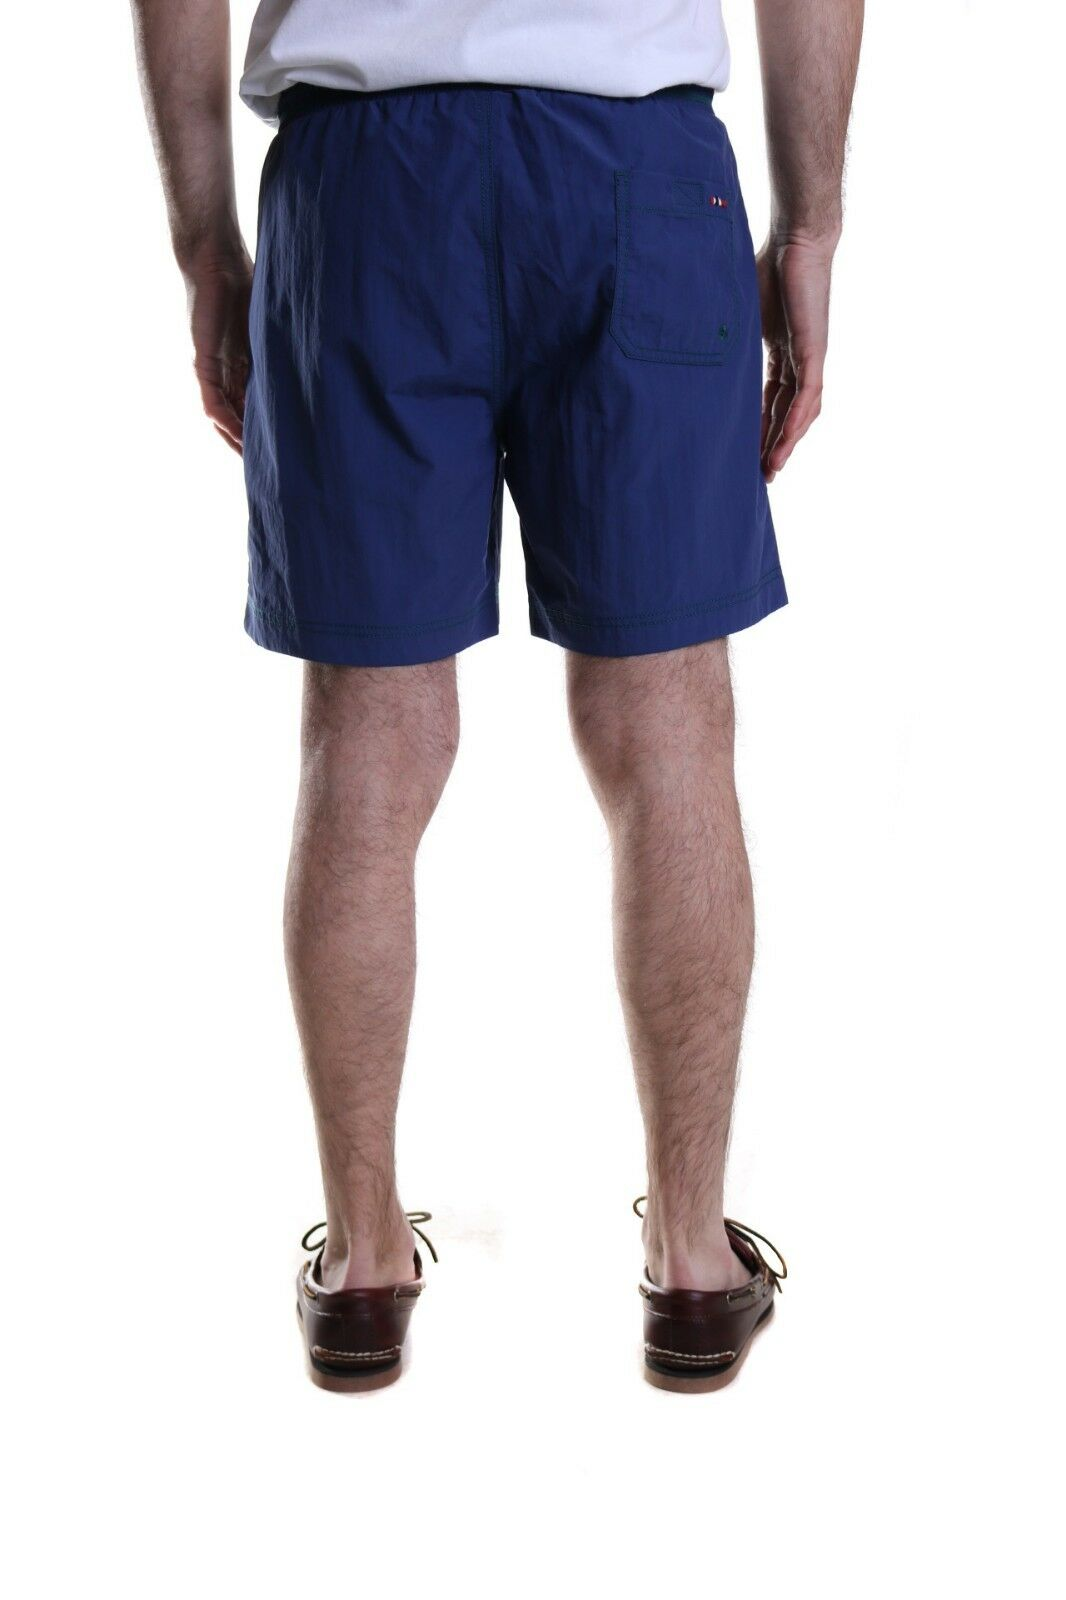 NAPAPIJRI Villa Trunk Shorts De Bain Bain Bain en Bleu Profondeurs vente RRP £ 50 9eccce